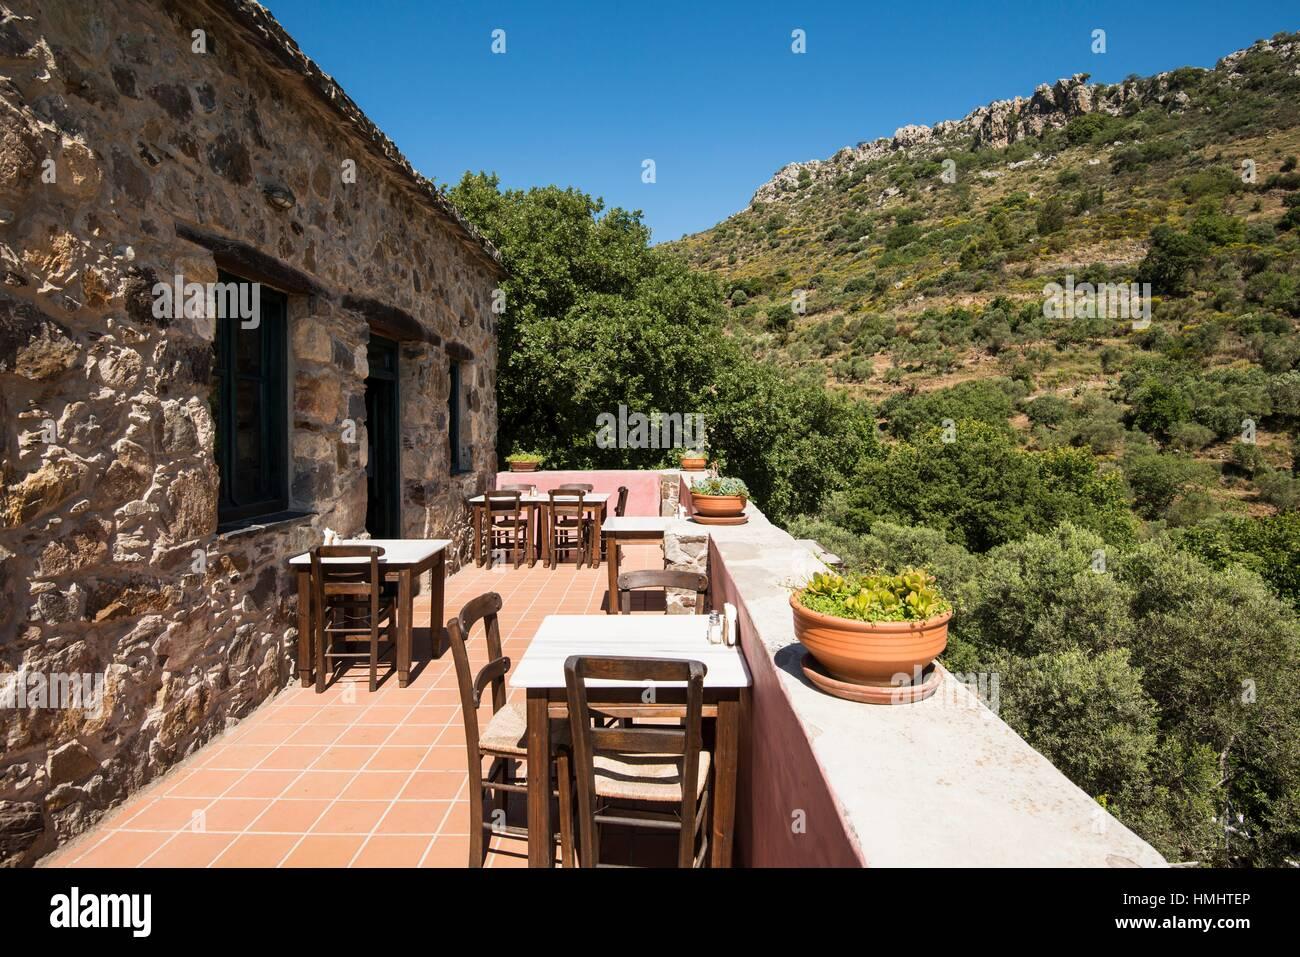 Restaurant balcony at Milia Mountain Retreat in Crete, Greece. - Stock Image